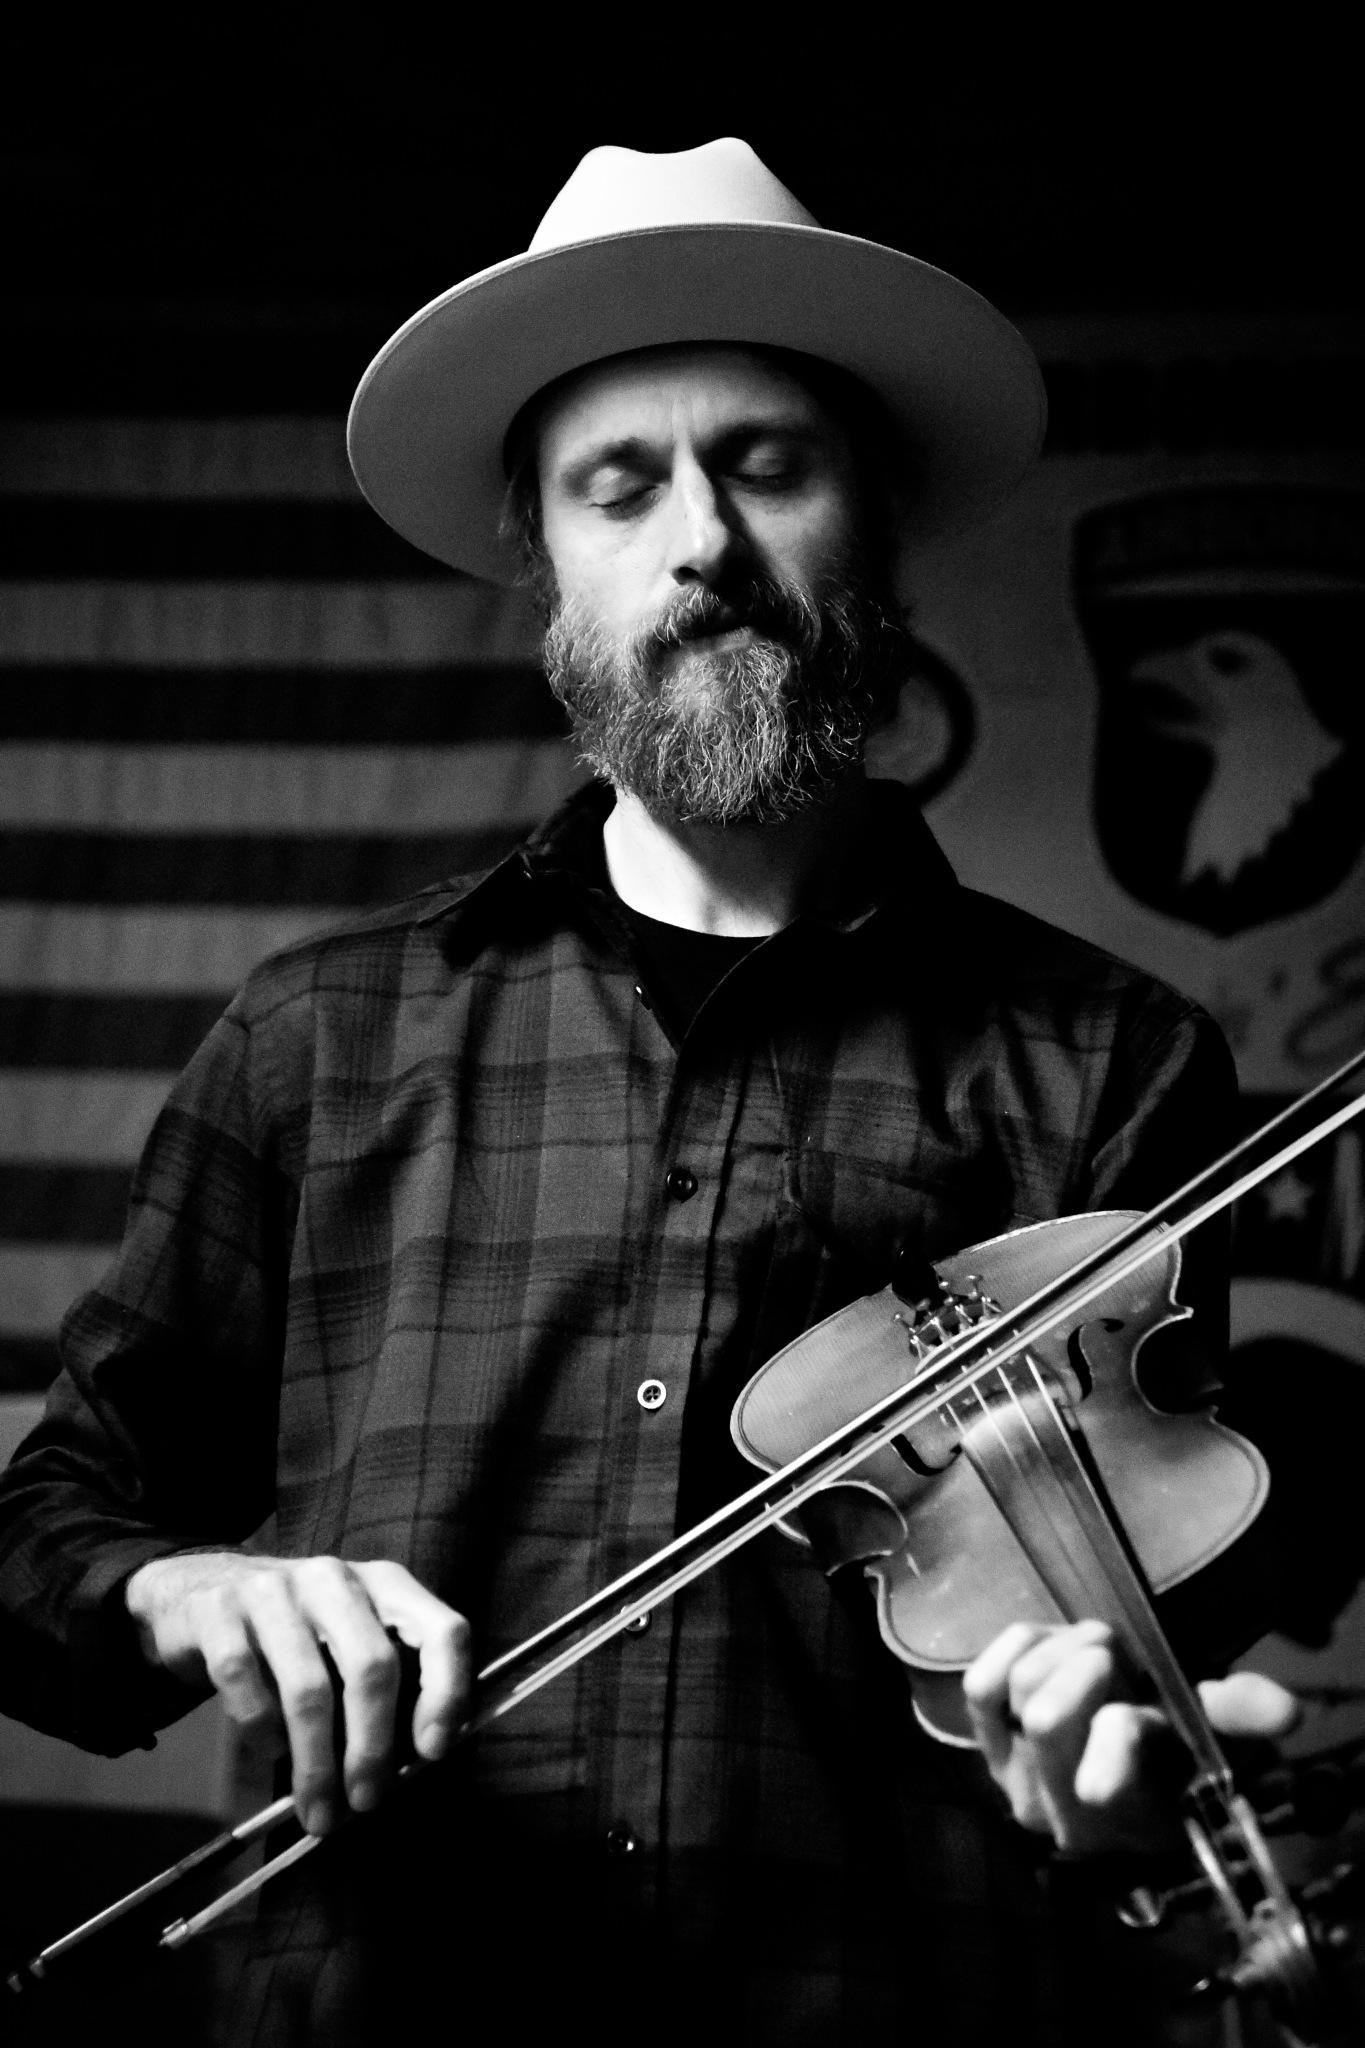 Travis Brink, The Texas Fiddle maverick. by Heidi Reinhardt